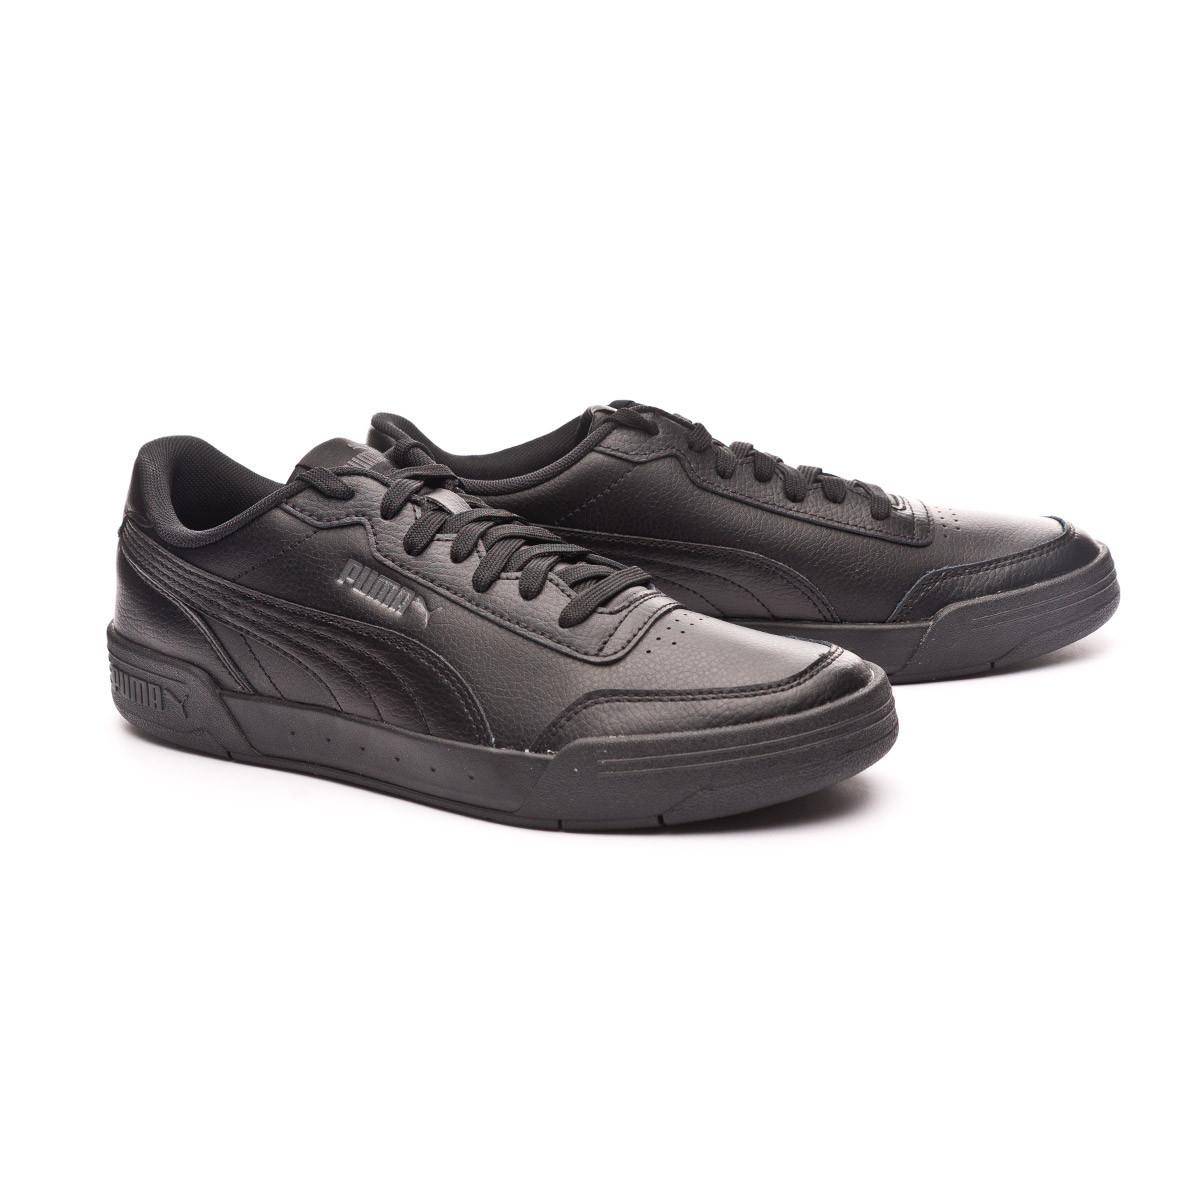 puma dark shadow shoes, OFF 77%,daralca